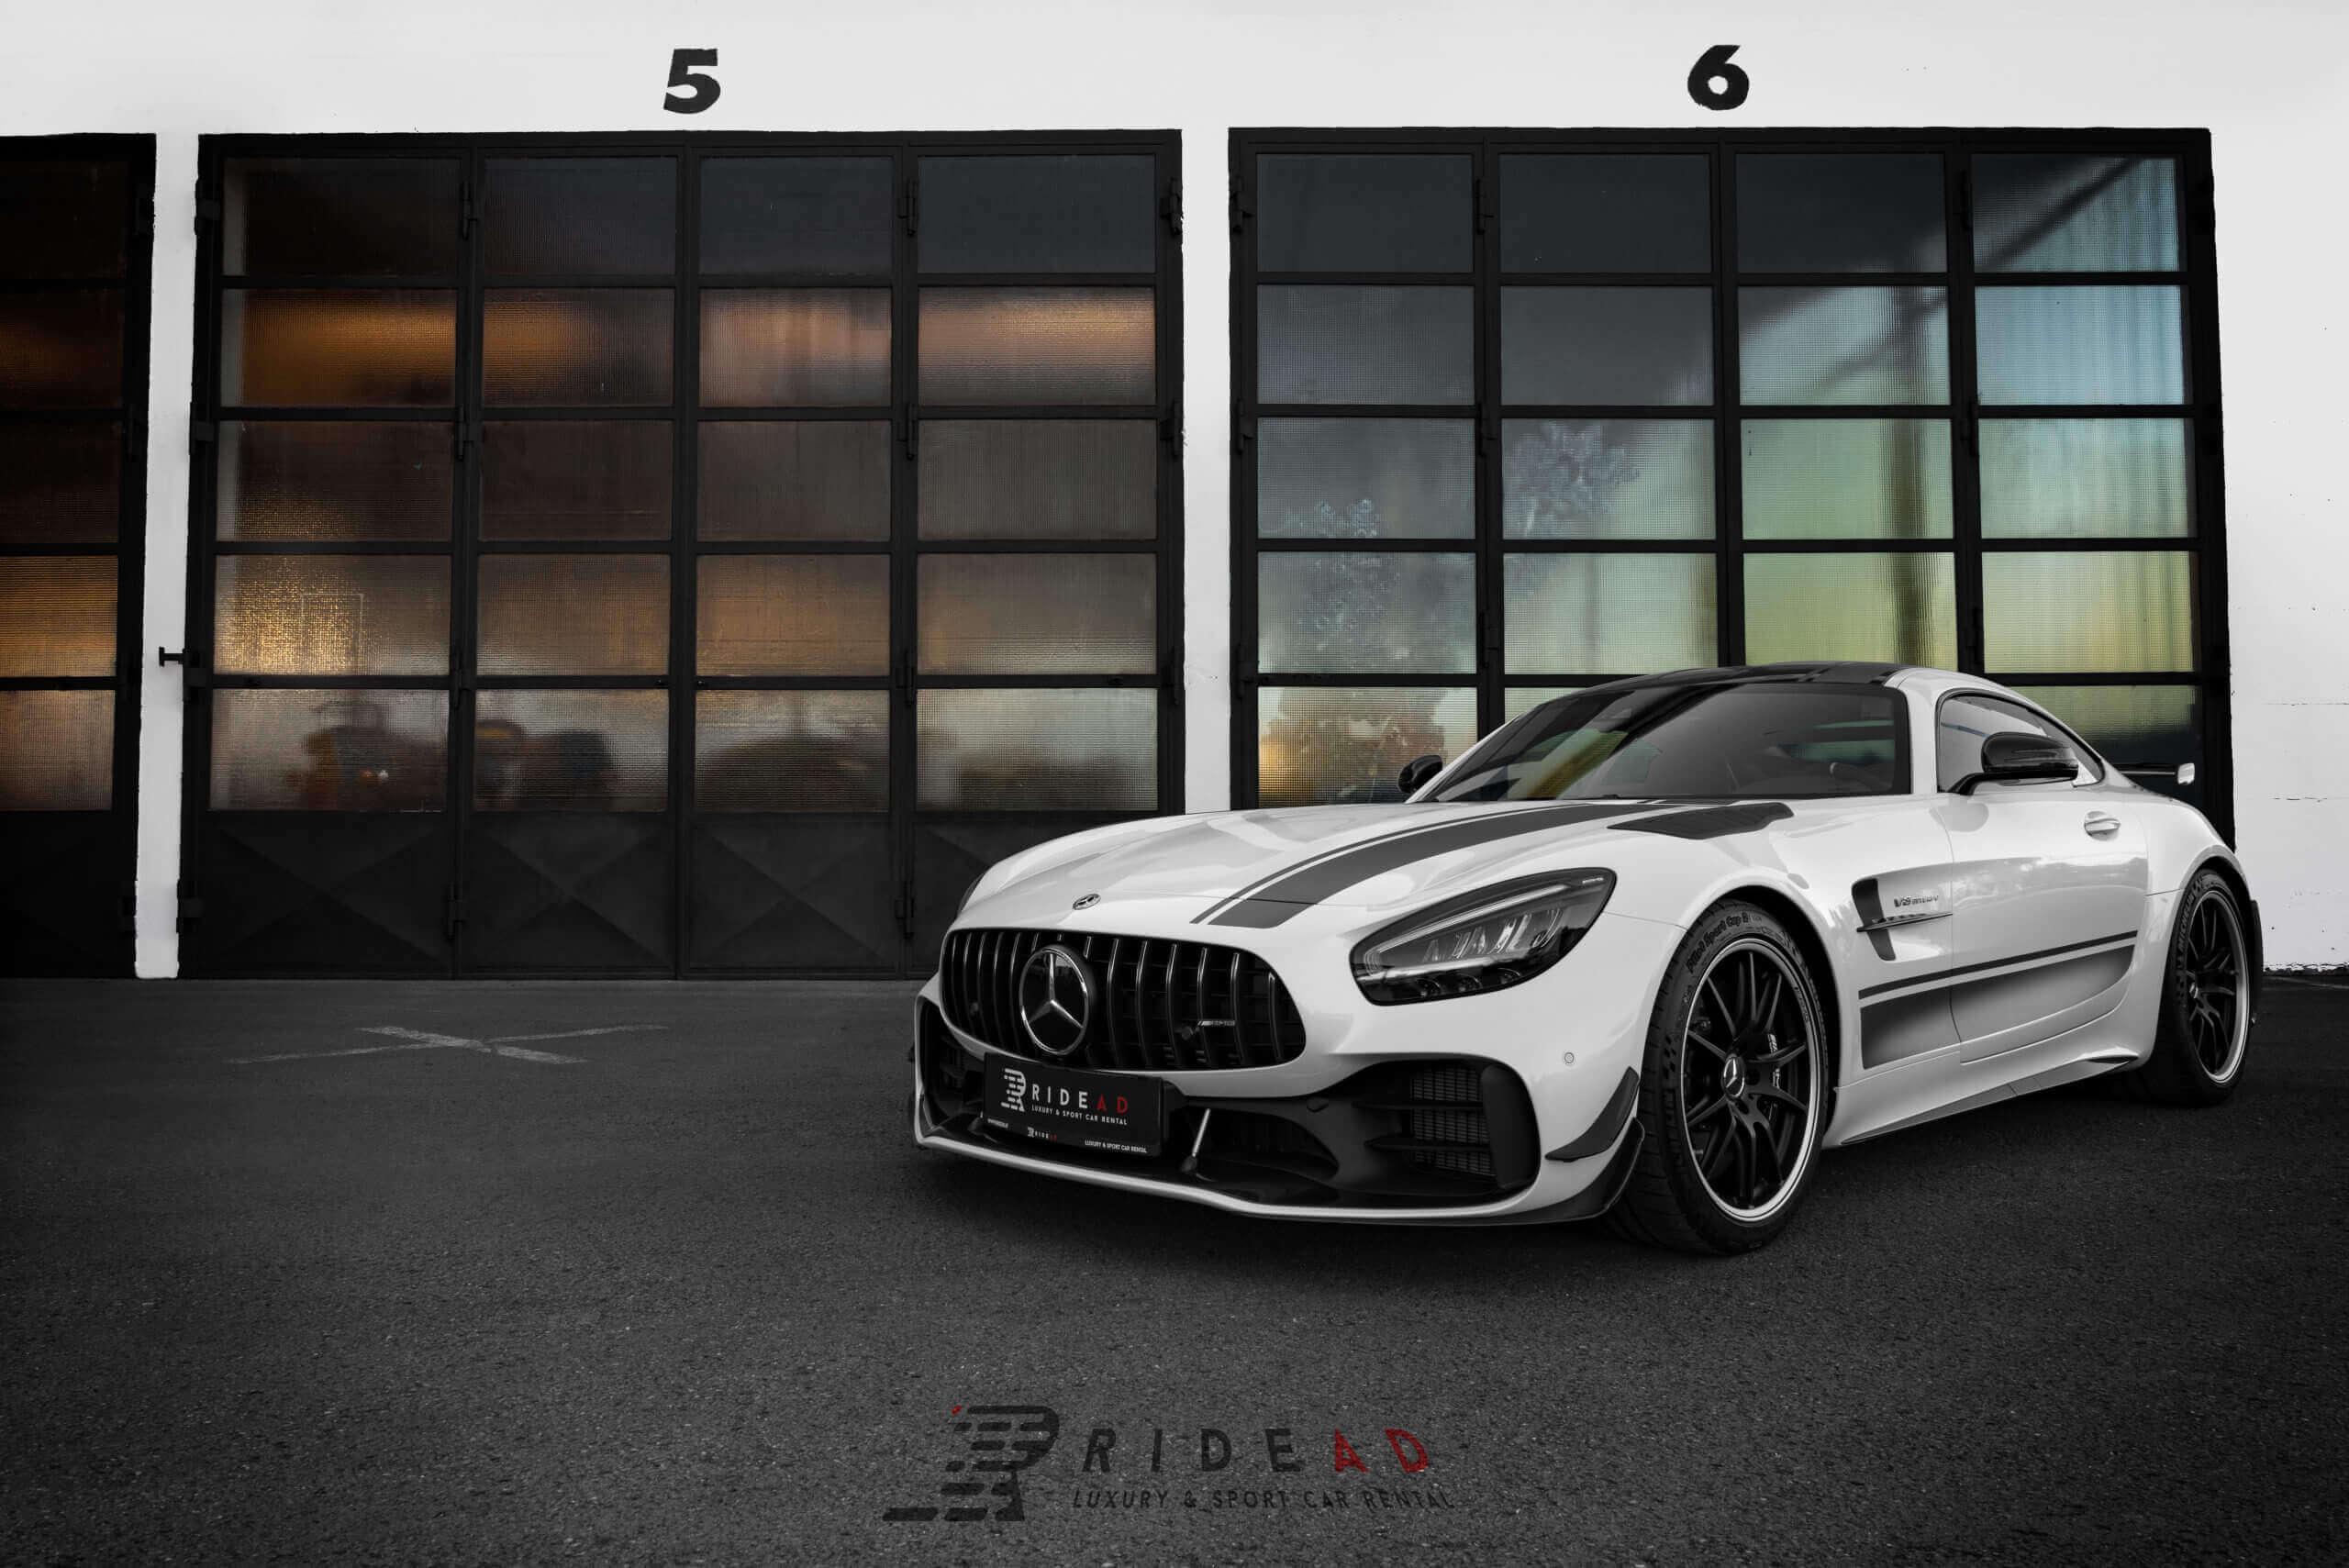 Ride Ad Luxury and Sports Car Rental - Mercedes-Benz AMG GTR PRO Kurzzeitmiete 1